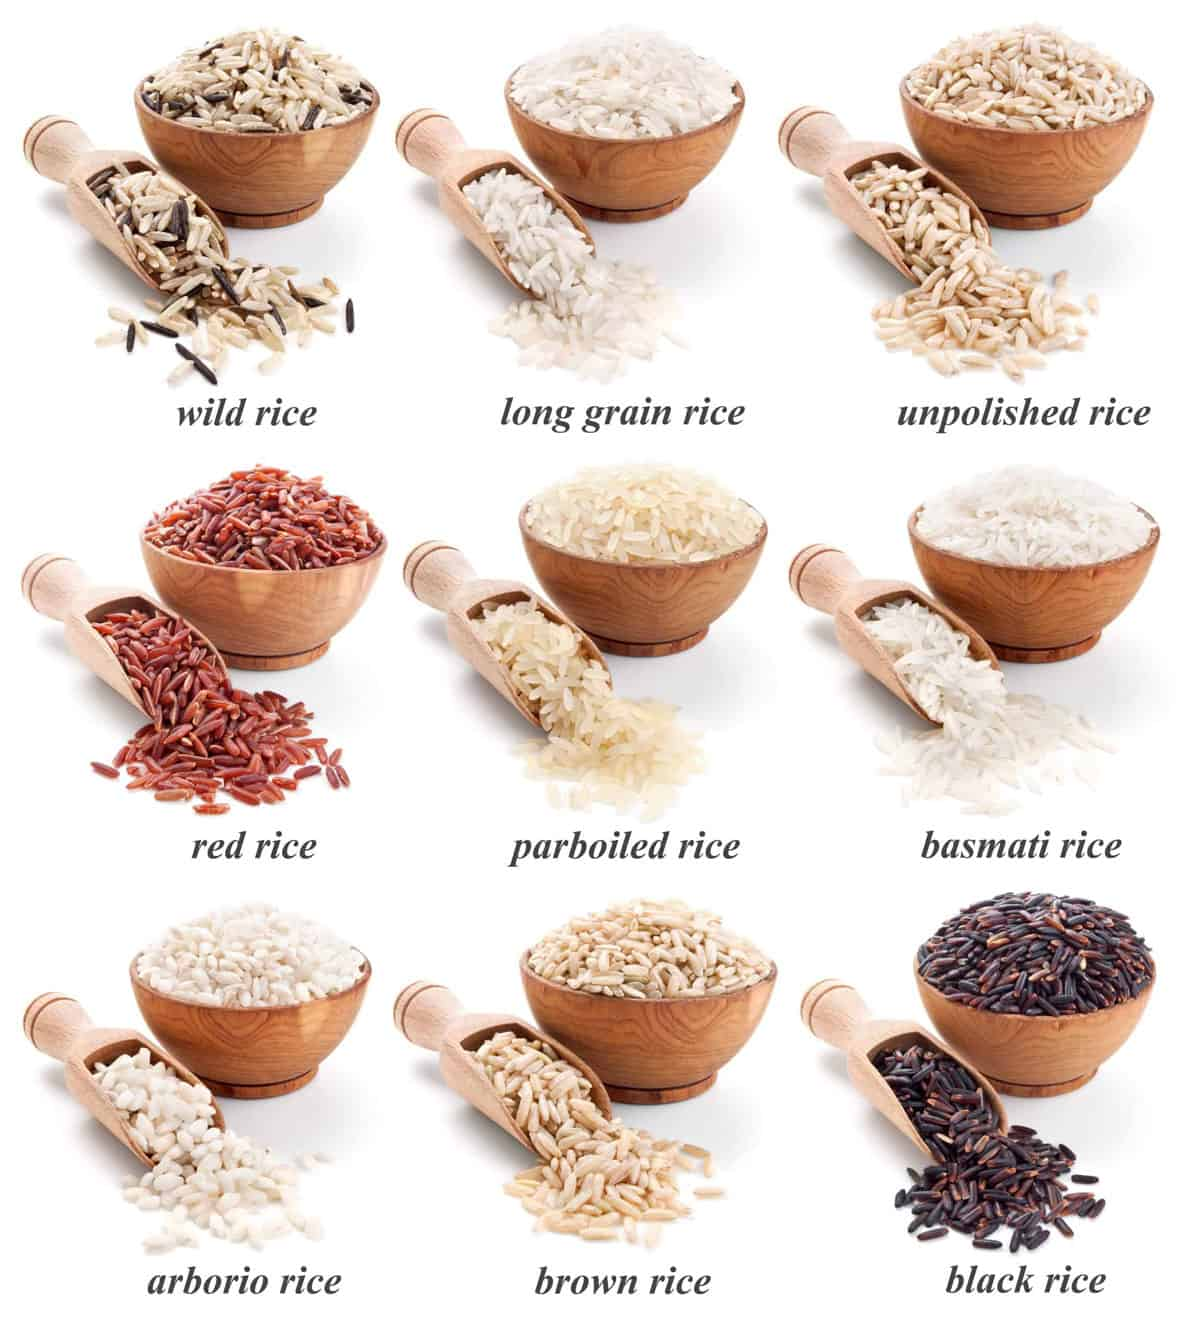 9 varieties of rice in individual bowls.